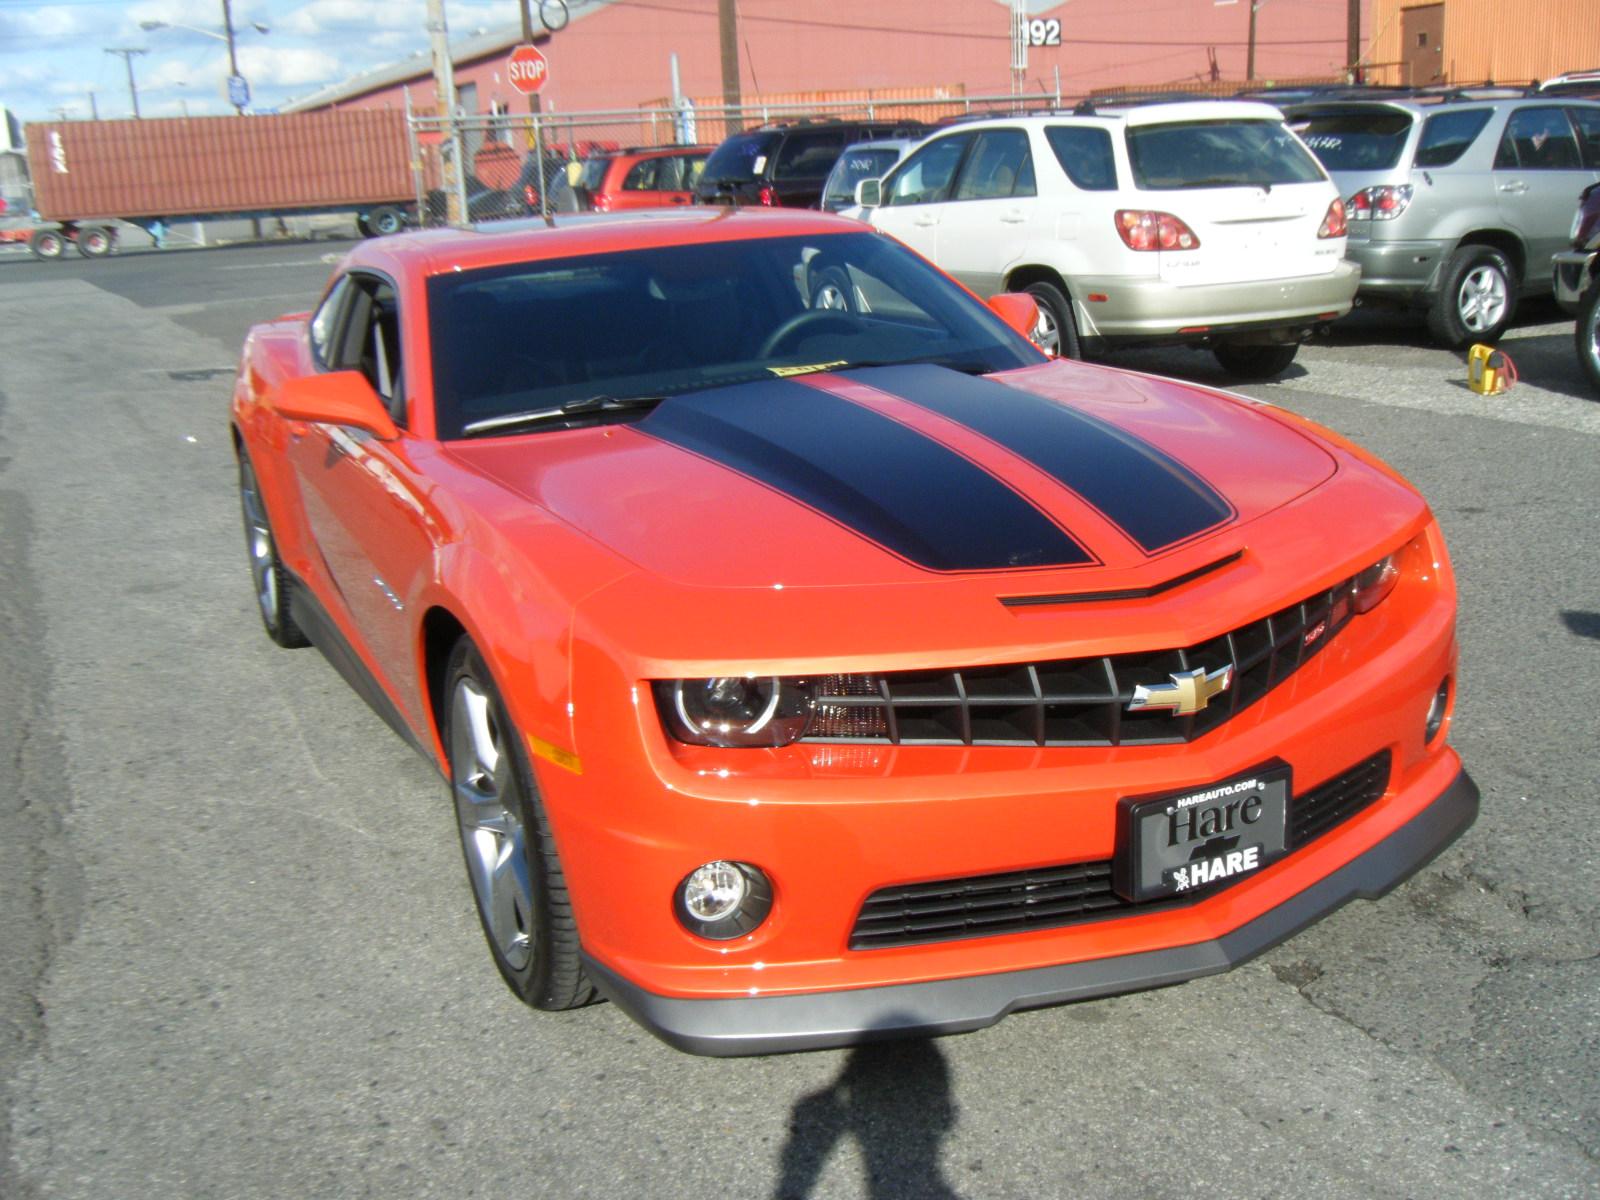 http://4.bp.blogspot.com/-PRoDZMfKMAo/T3SFuiJv9qI/AAAAAAAAACc/EV0dnhQN-m4/s1600/2010+Chevy+Camaro+-+orange.jpg